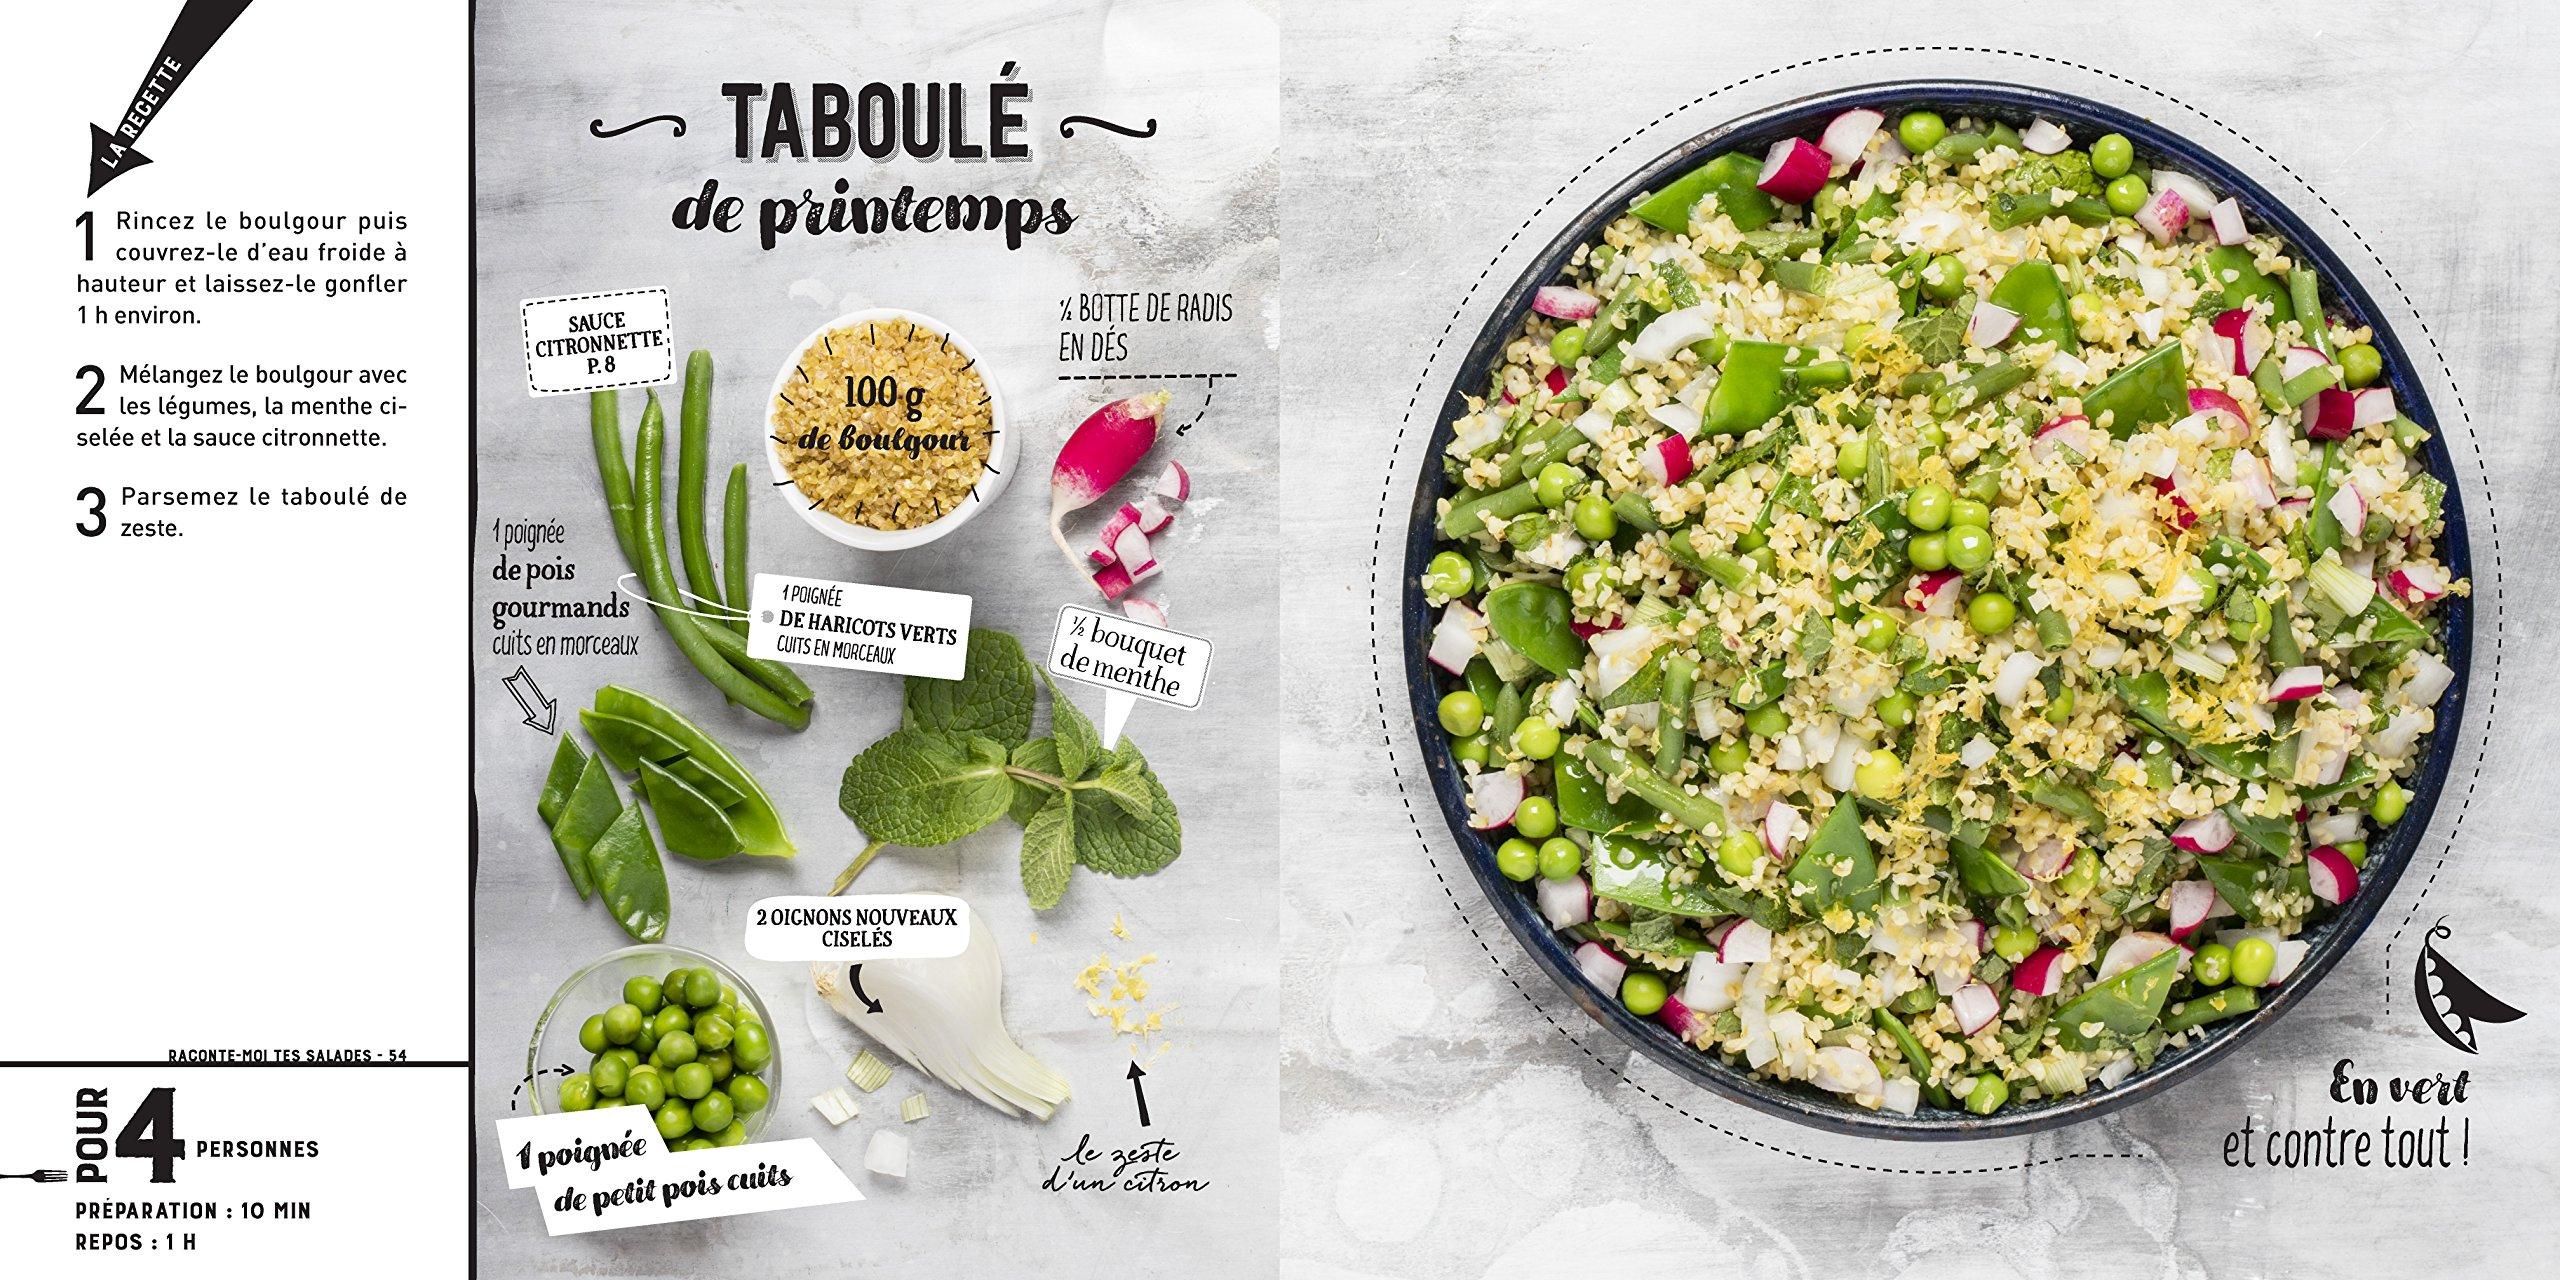 racontemoi tes salades